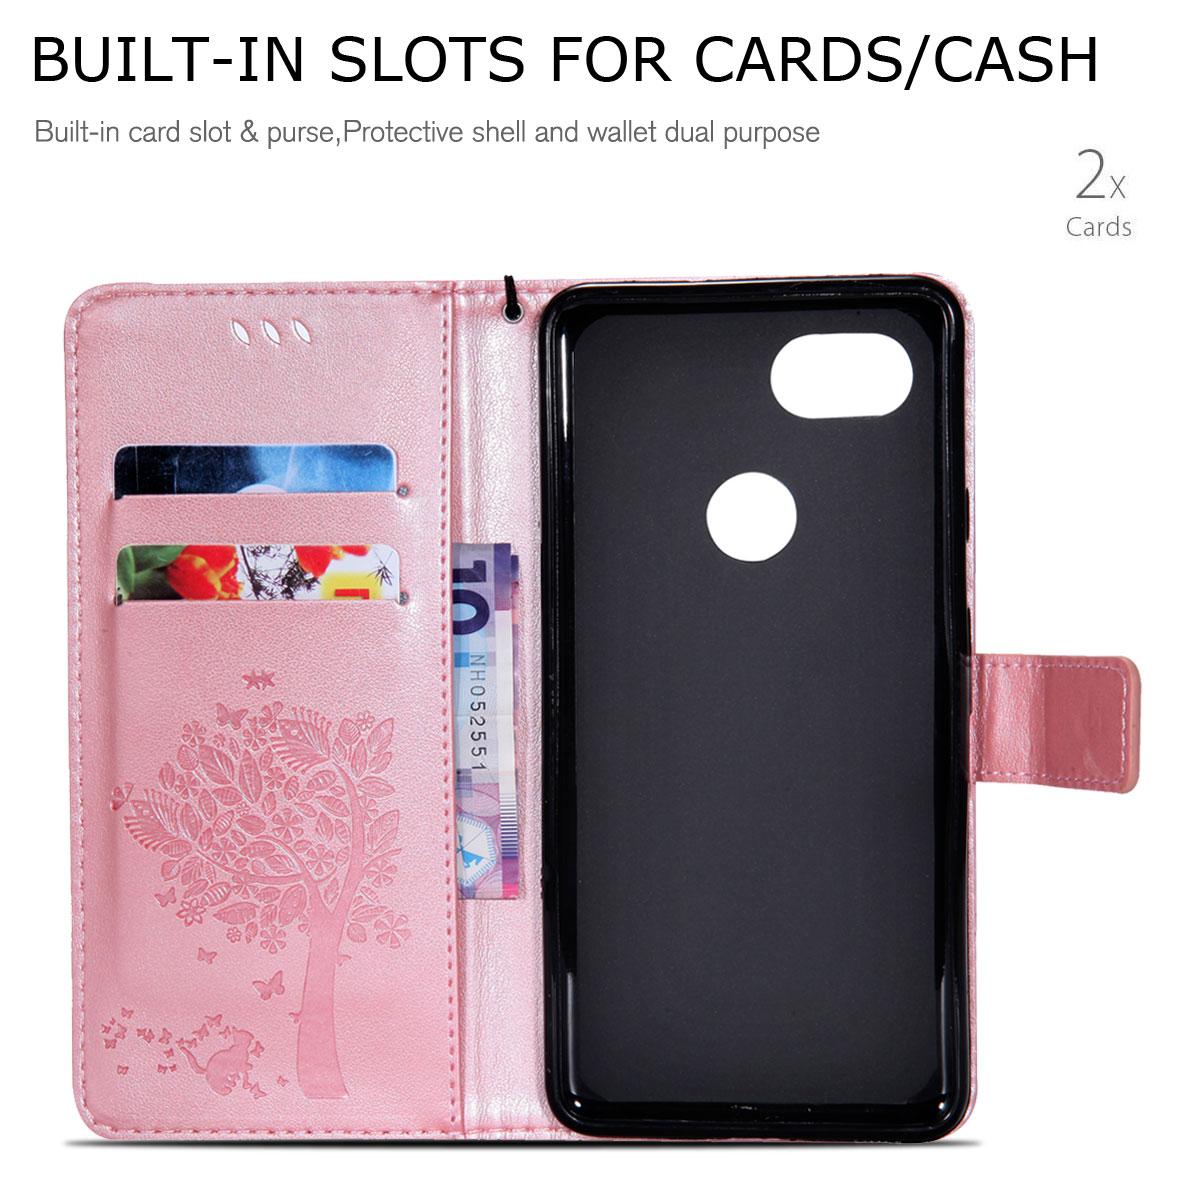 Magnetic-Leather-Credit-Card-Holder-Flip-Case-Cover-For-Google-Pixel-2-2-XL thumbnail 90